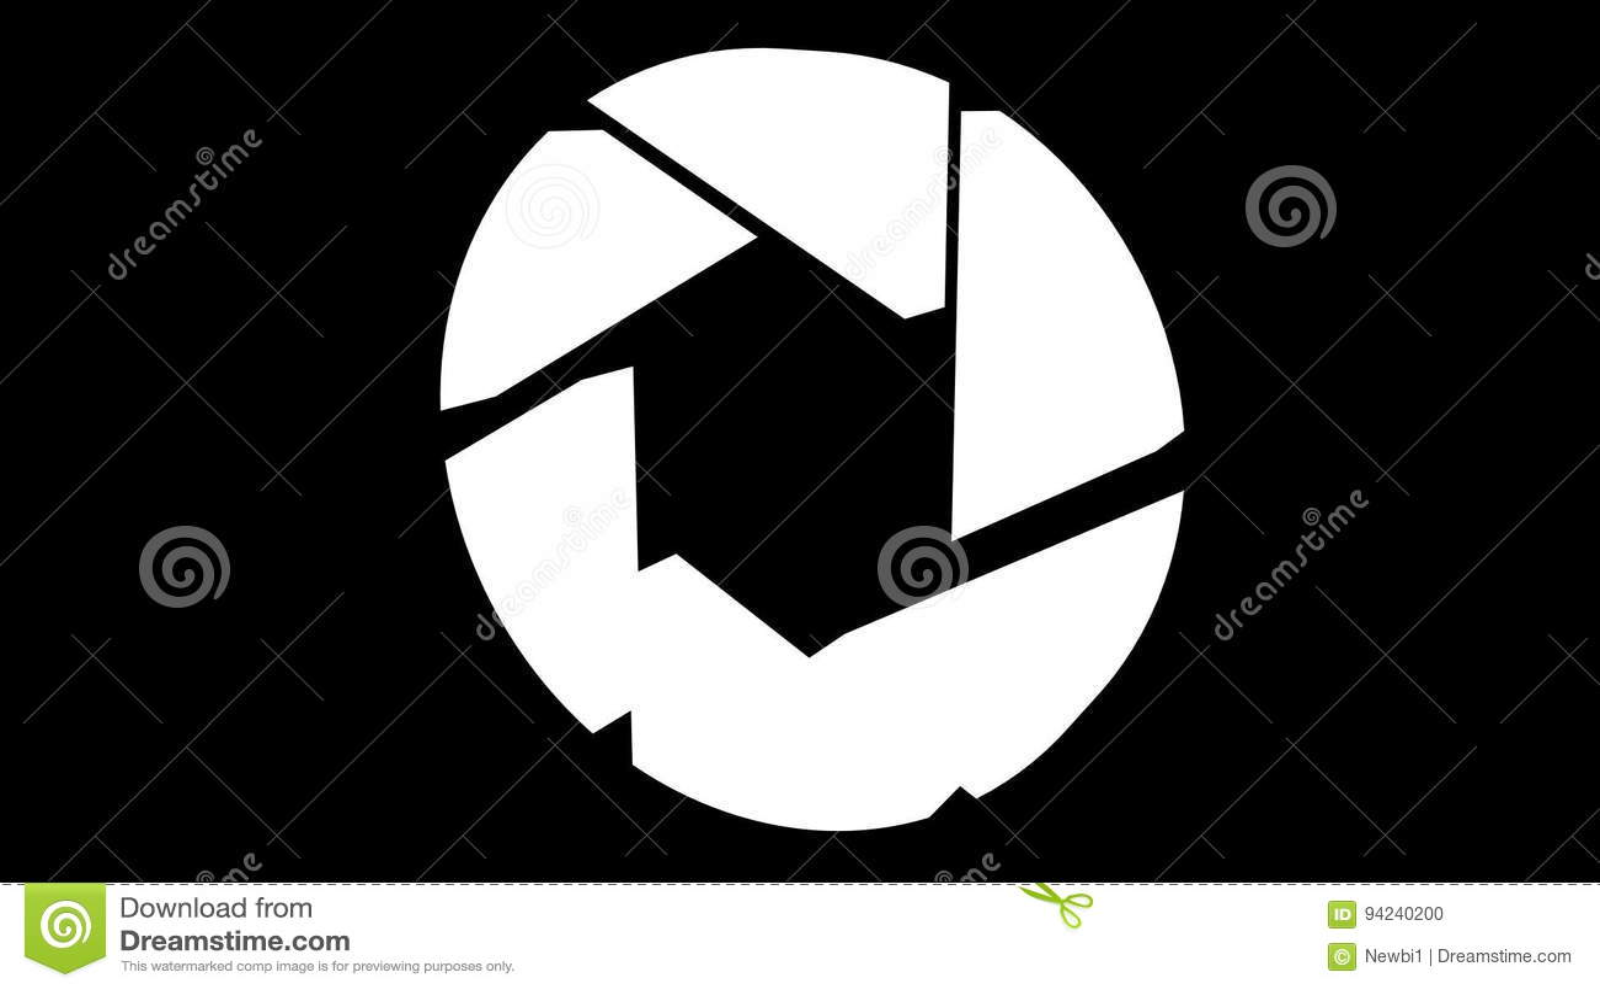 Aperture iris diaphragm logo rotate stock footage video of aperture iris diaphragm logo rotate stock footage video of business decoration 94240200 ccuart Gallery